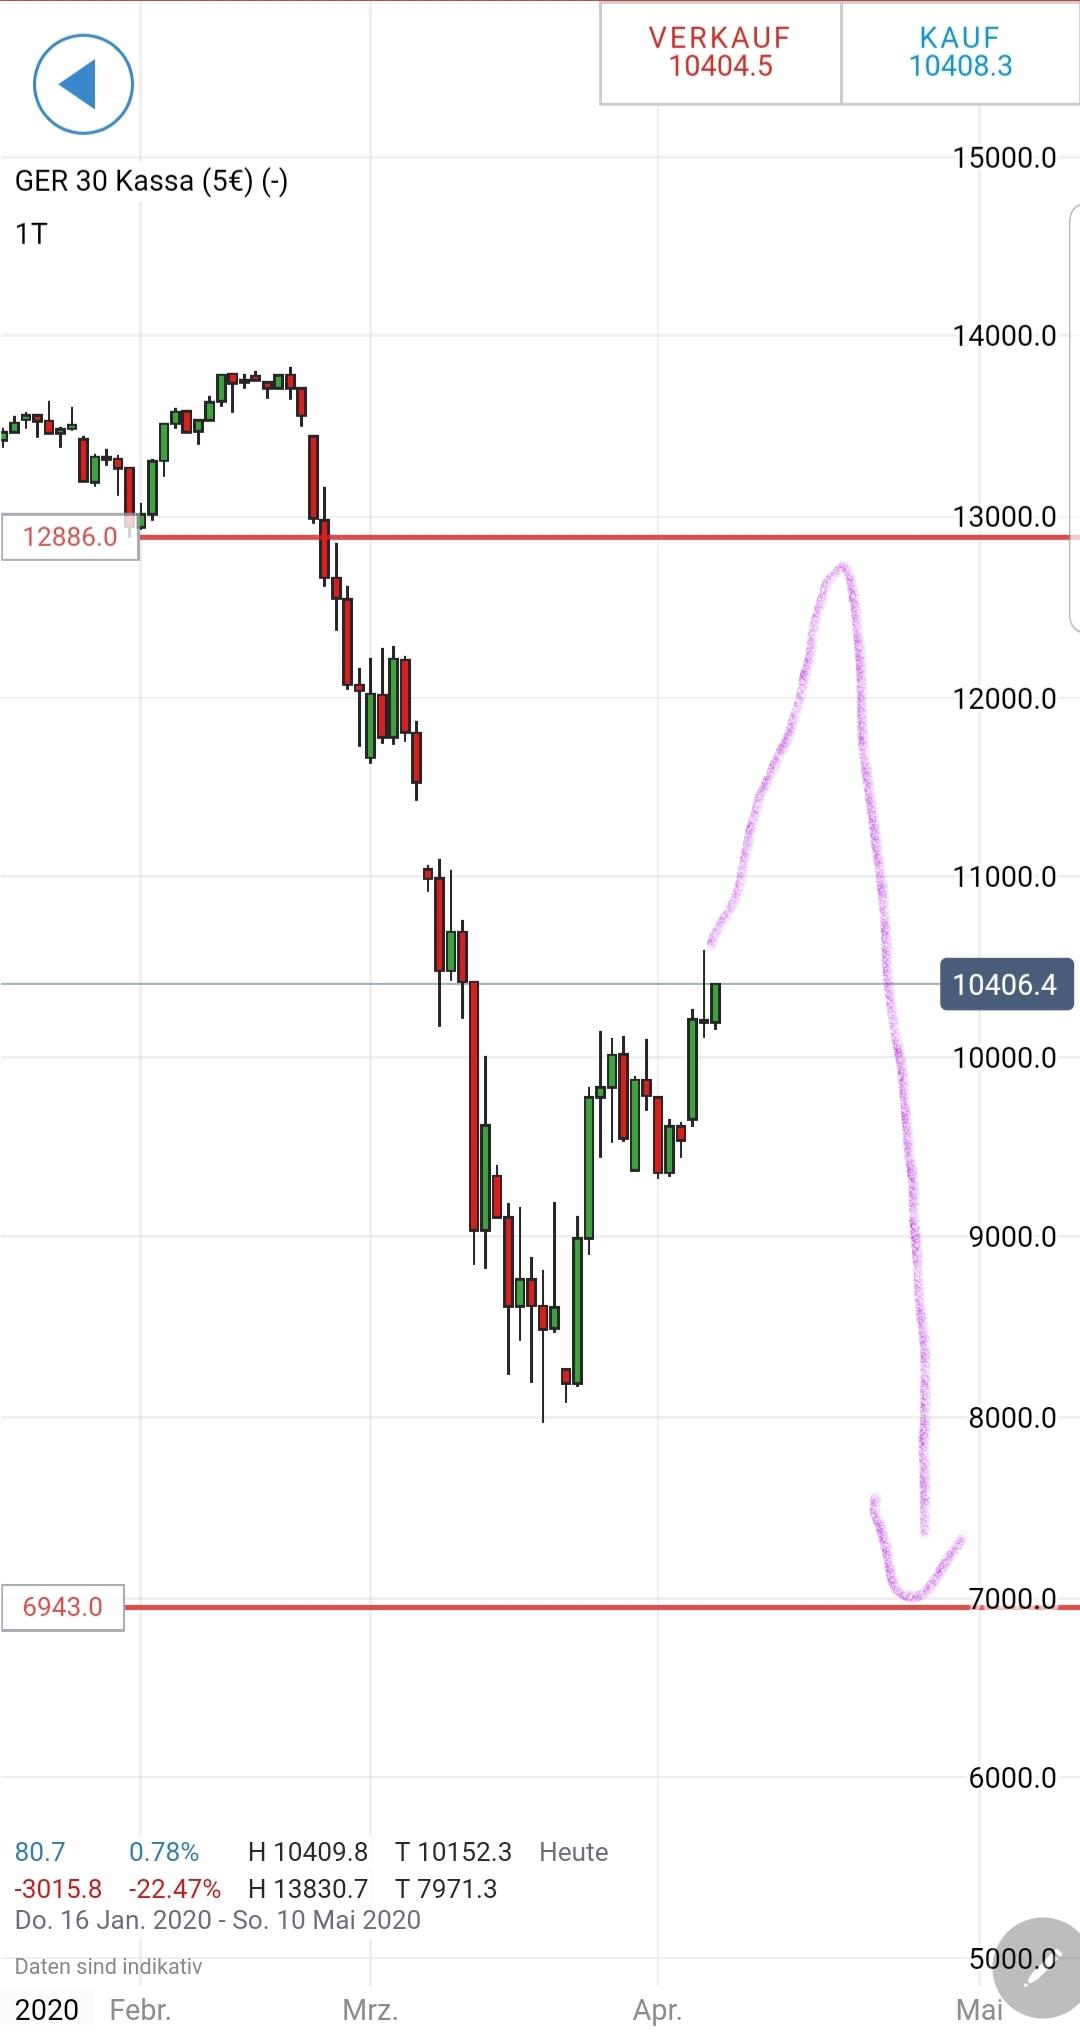 screenshot_20200408-210627_ig_trading.jpg